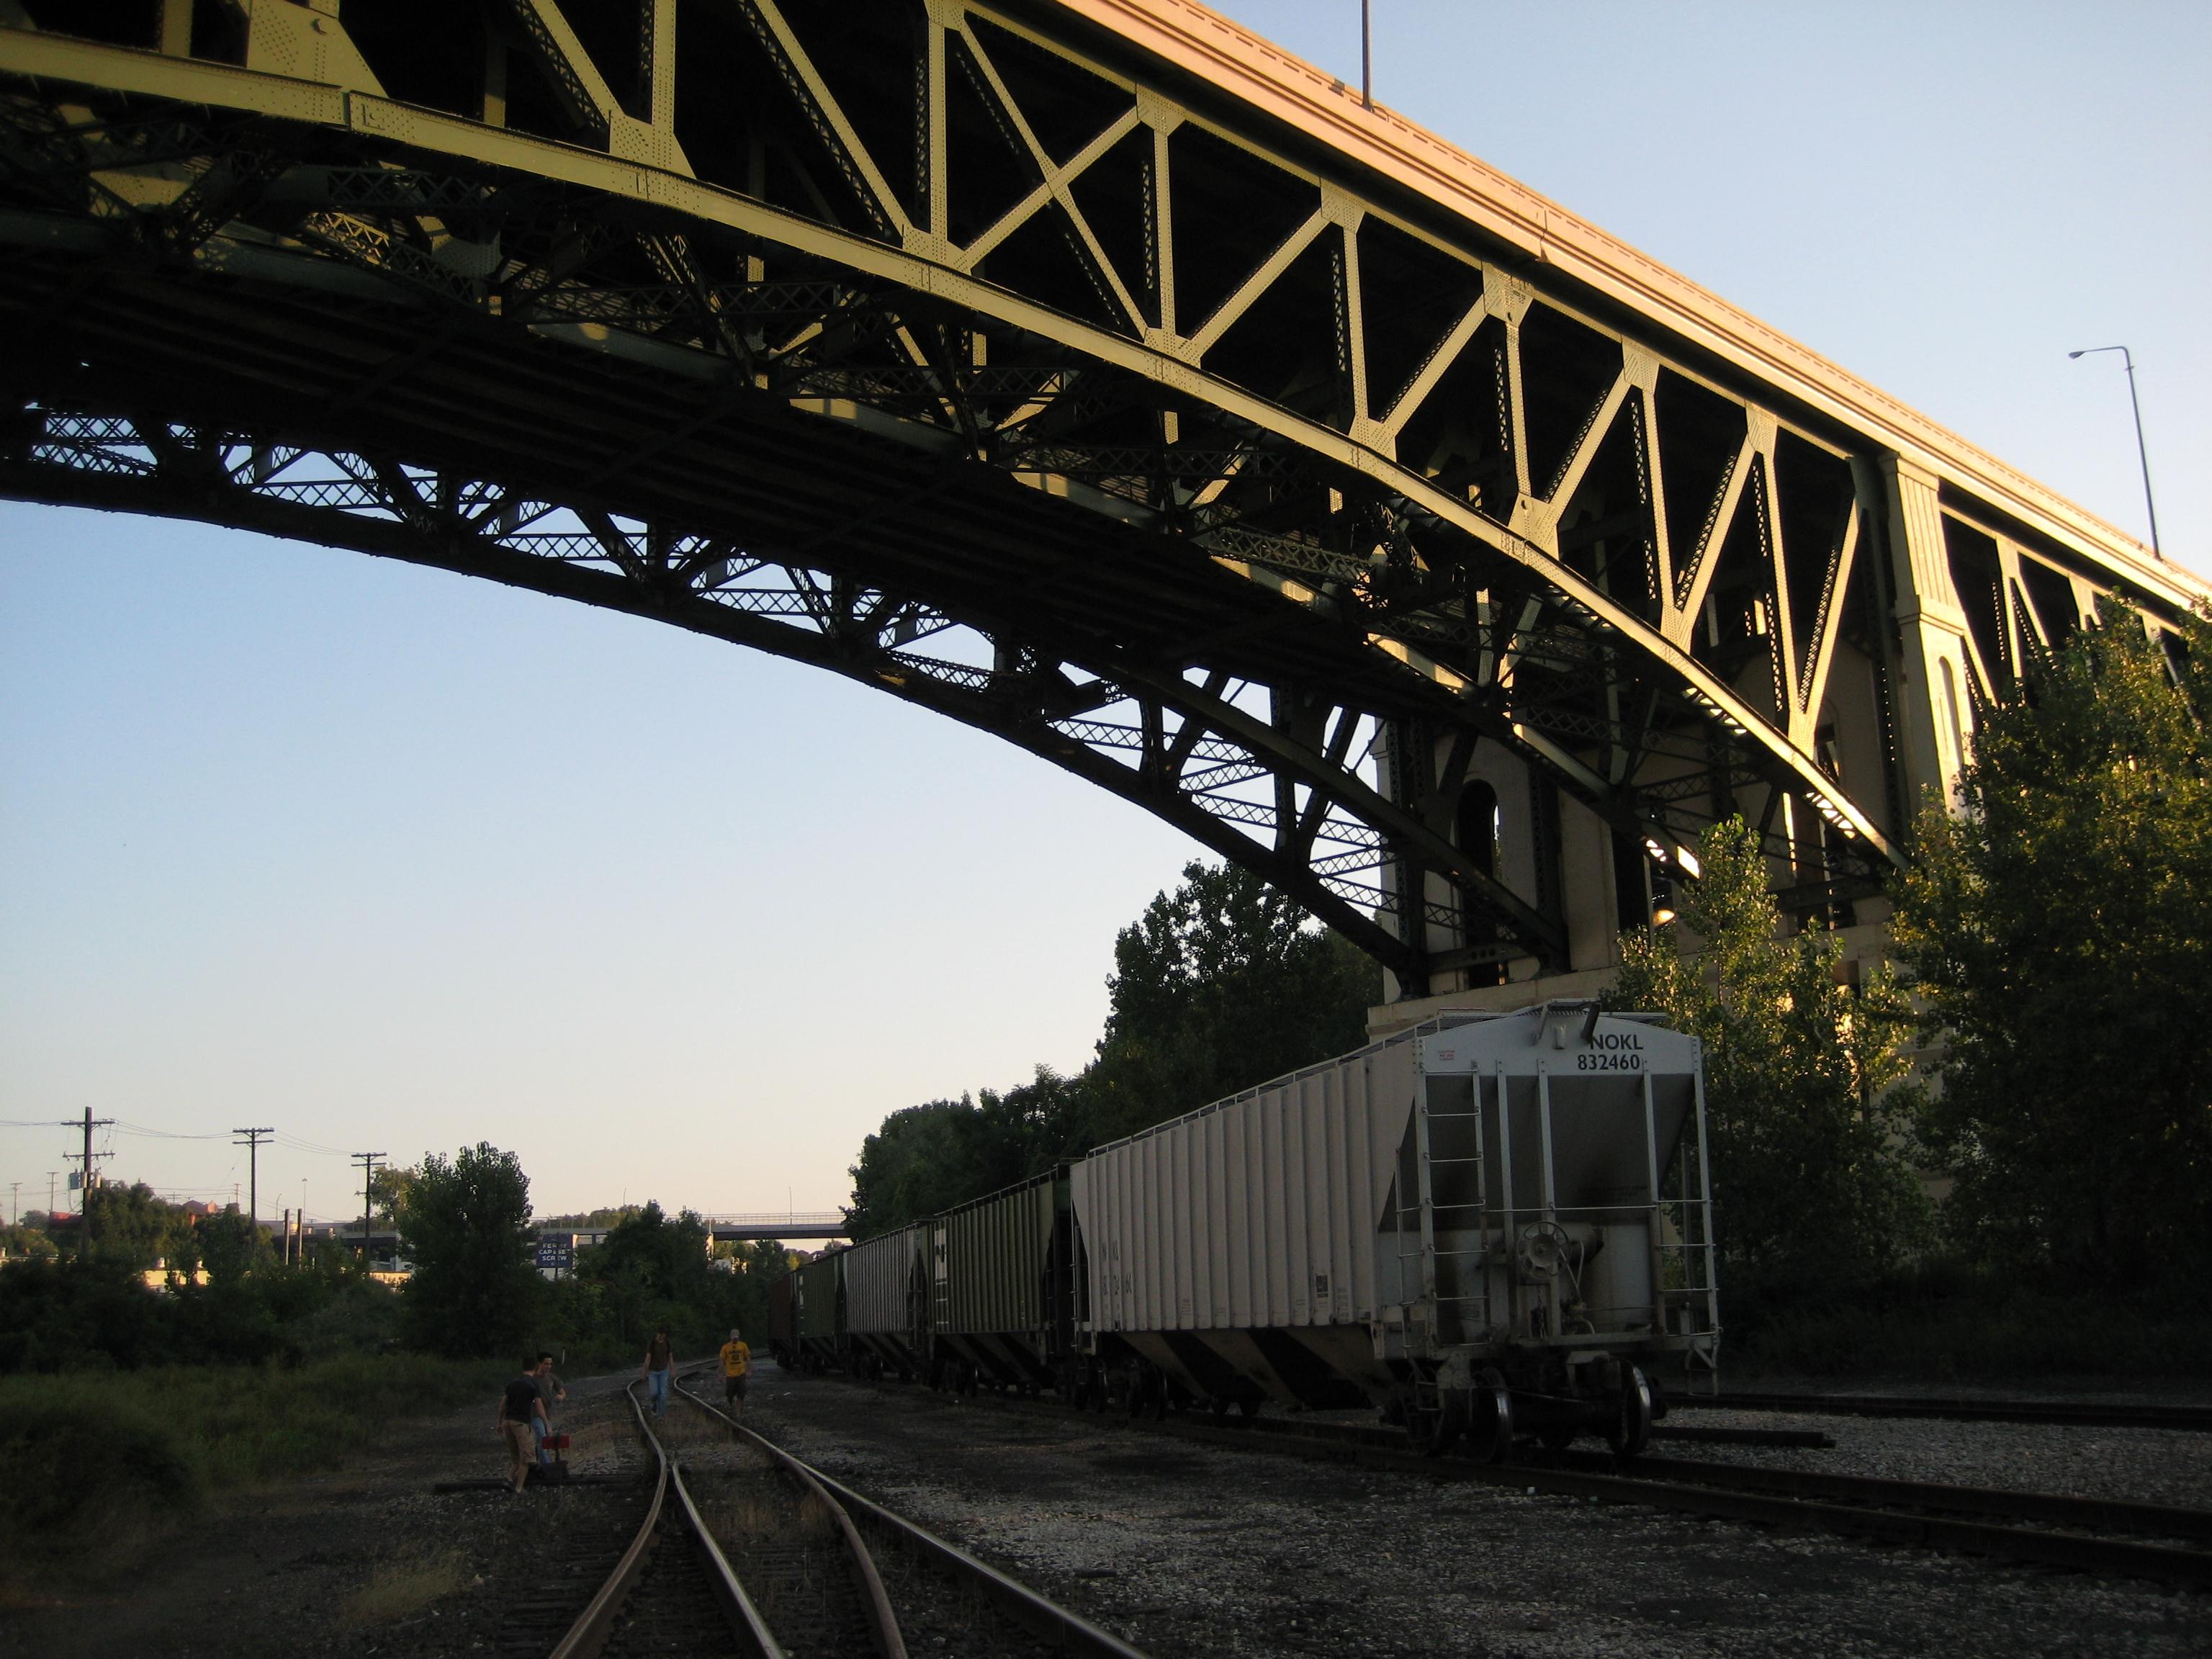 Filerail Under The Bridge Jpg